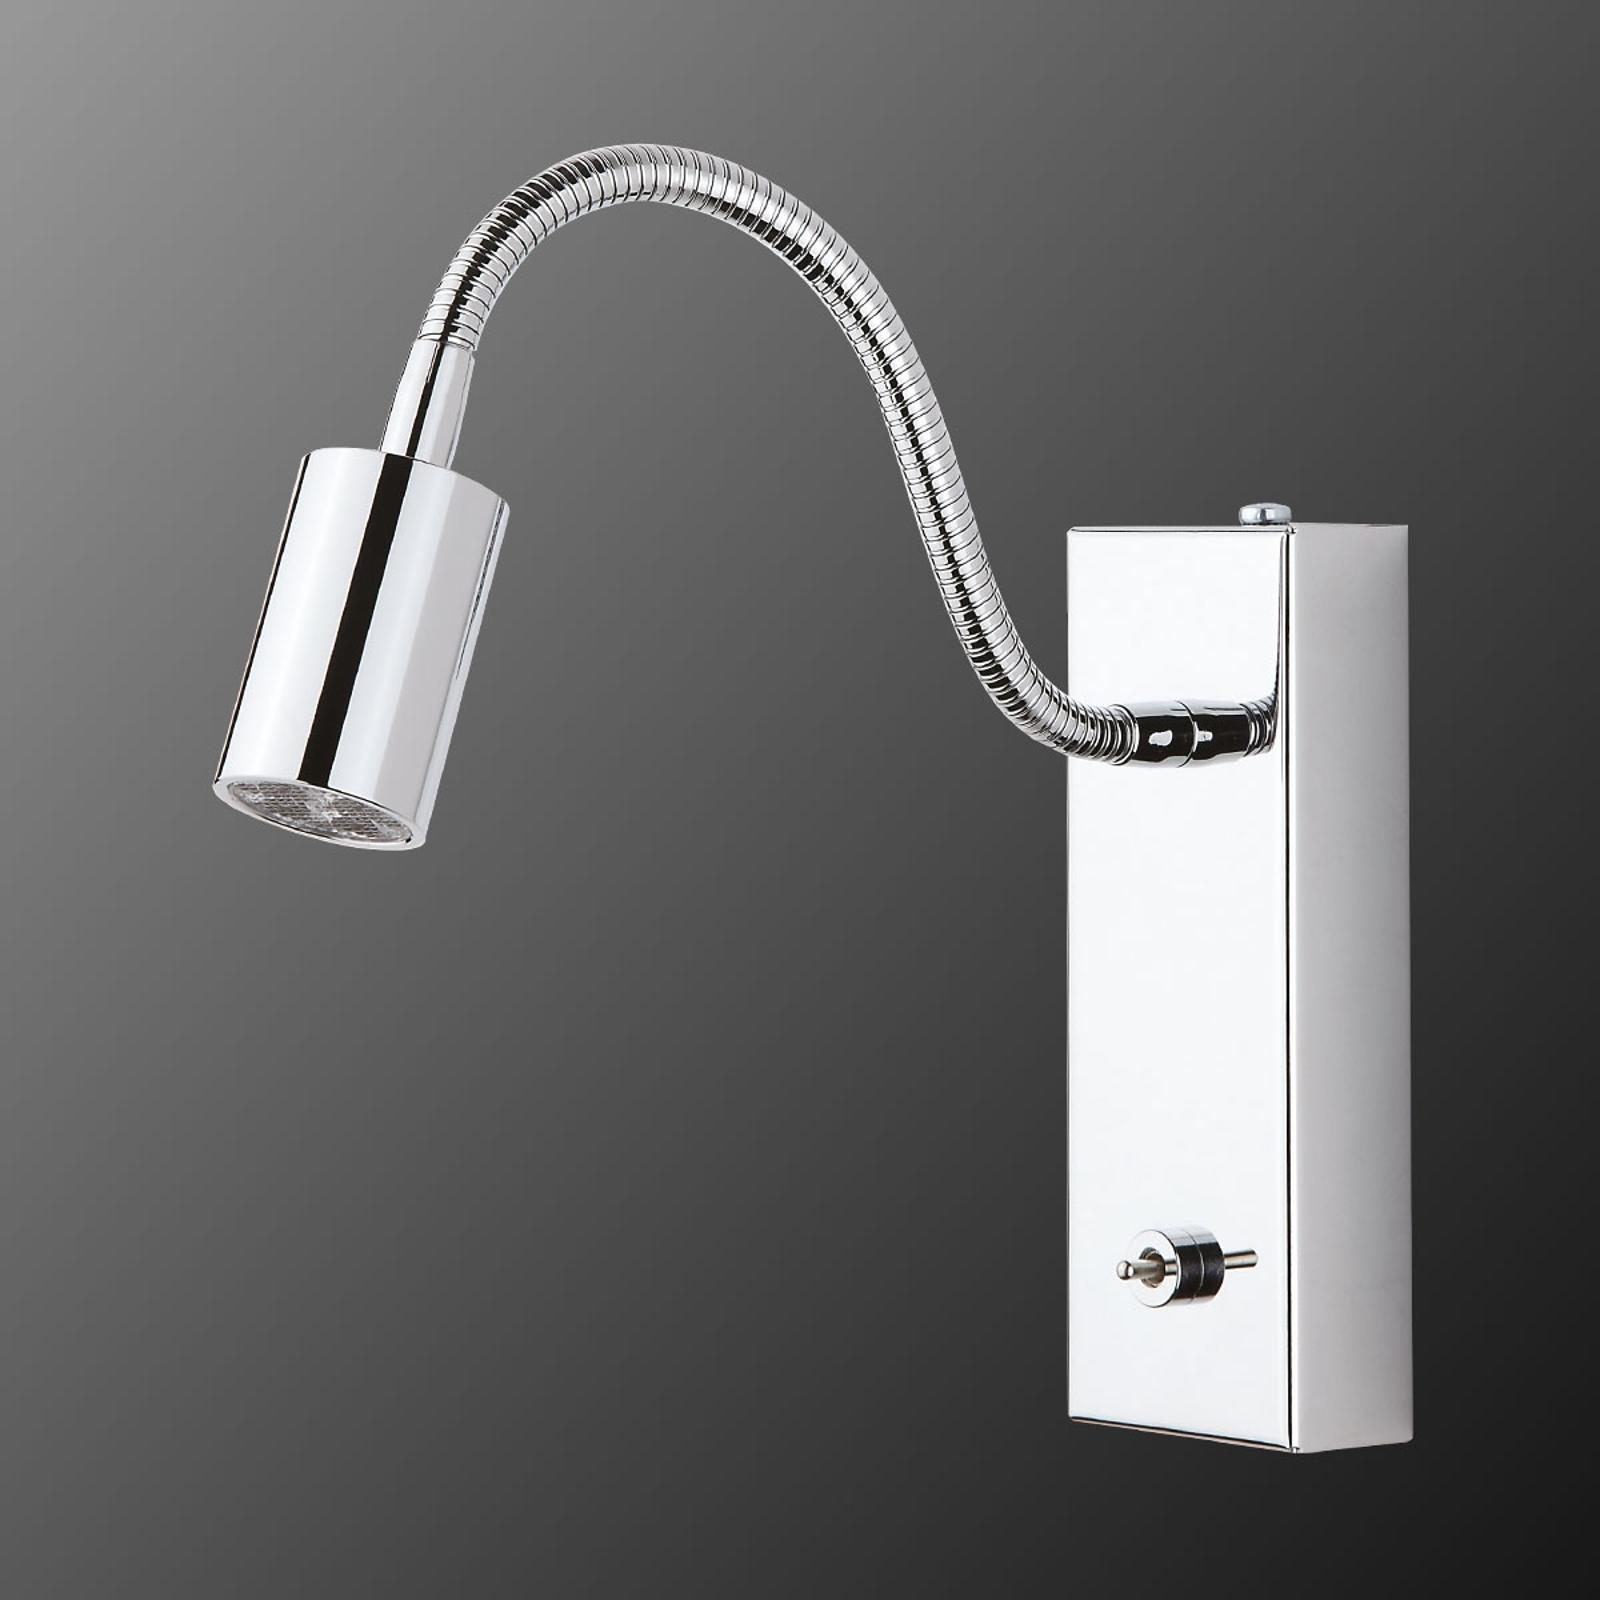 Applique LED regolabile con interruttore